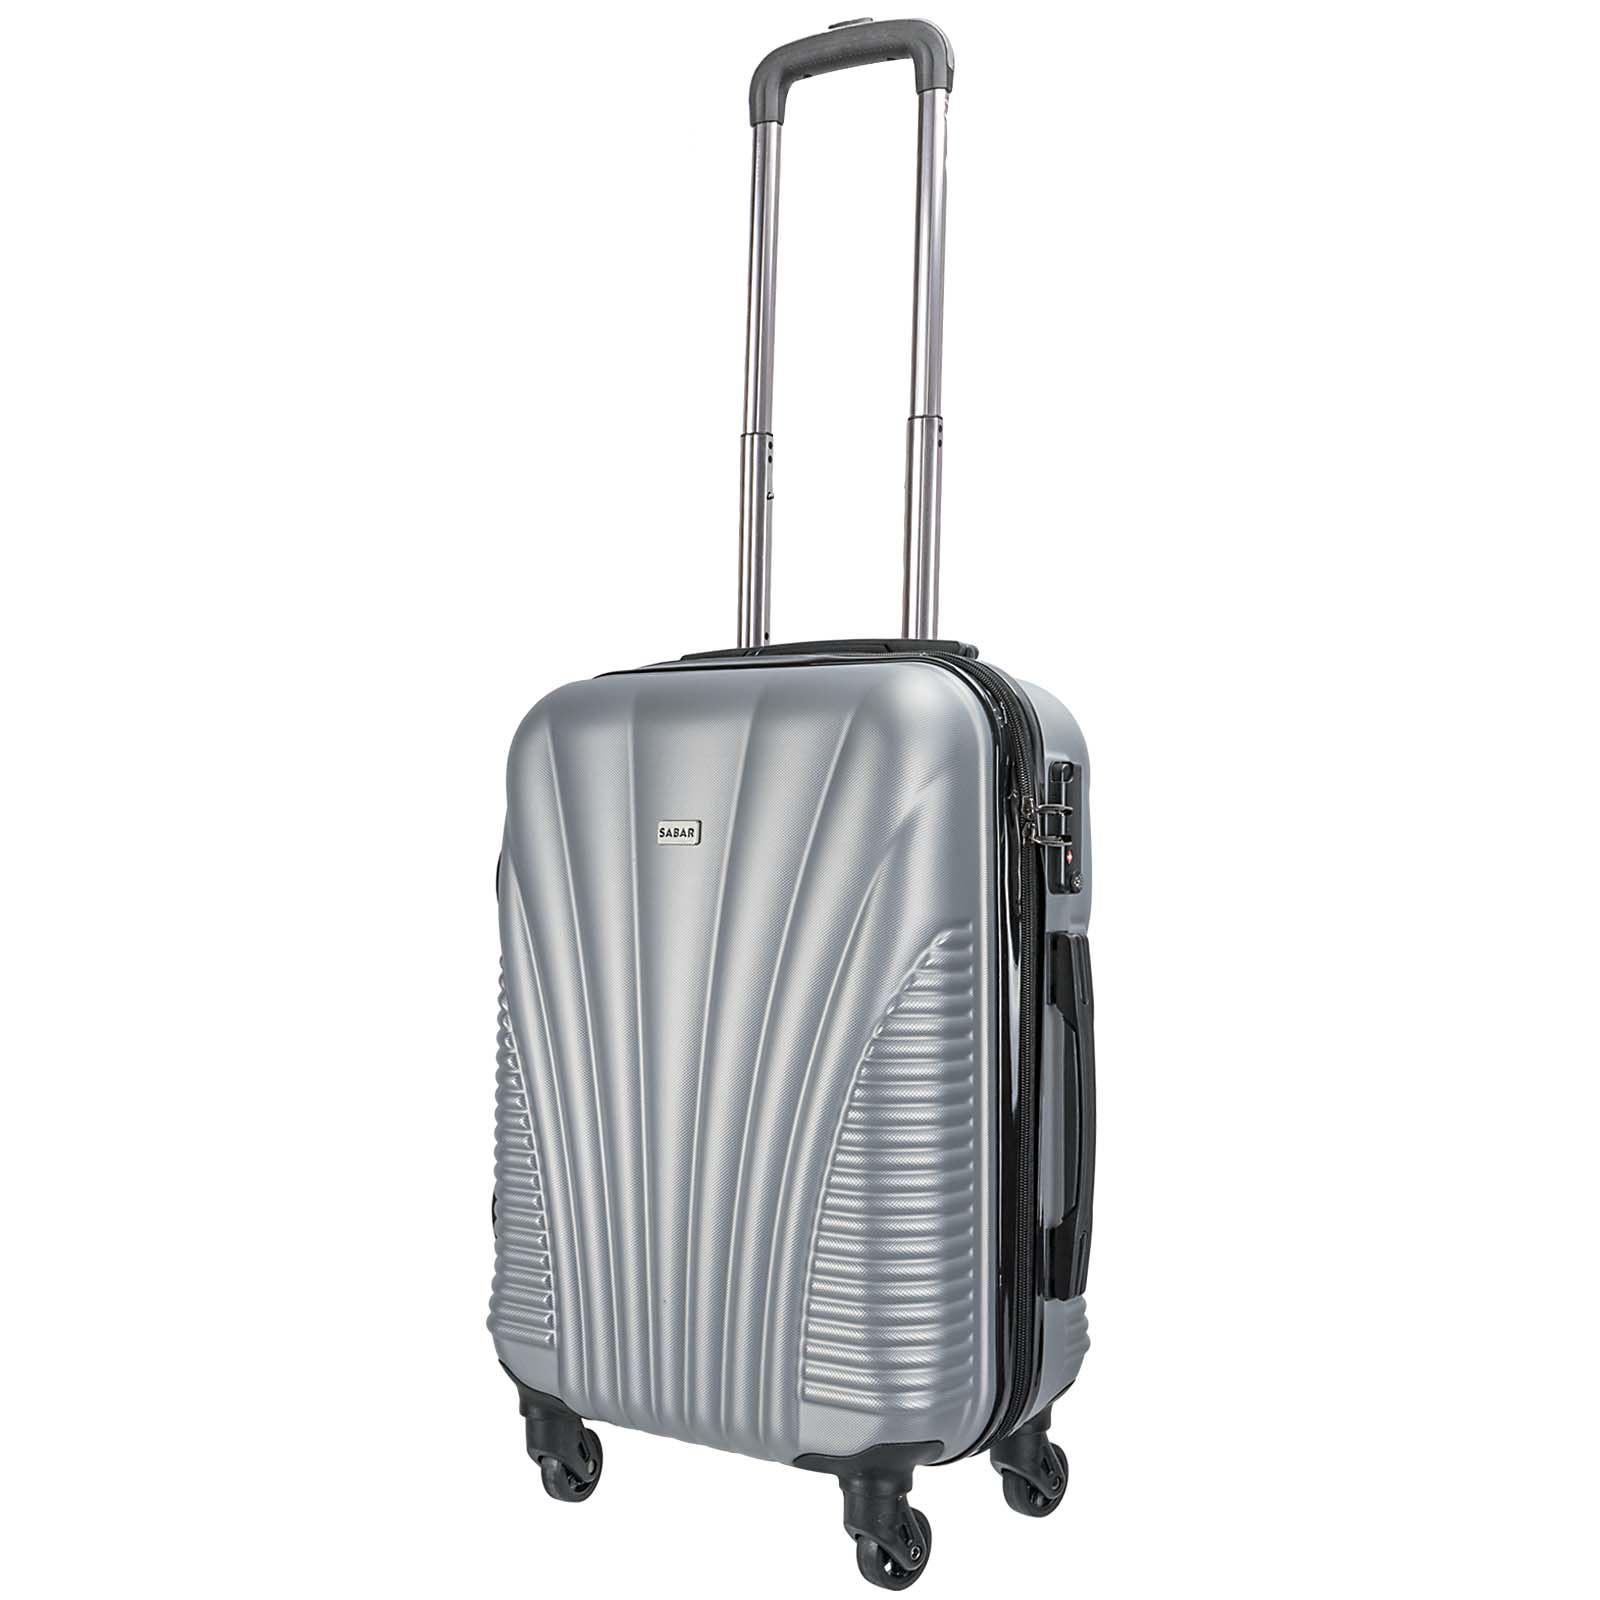 luggage set hard shell trolley suitcase spinner wheels. Black Bedroom Furniture Sets. Home Design Ideas